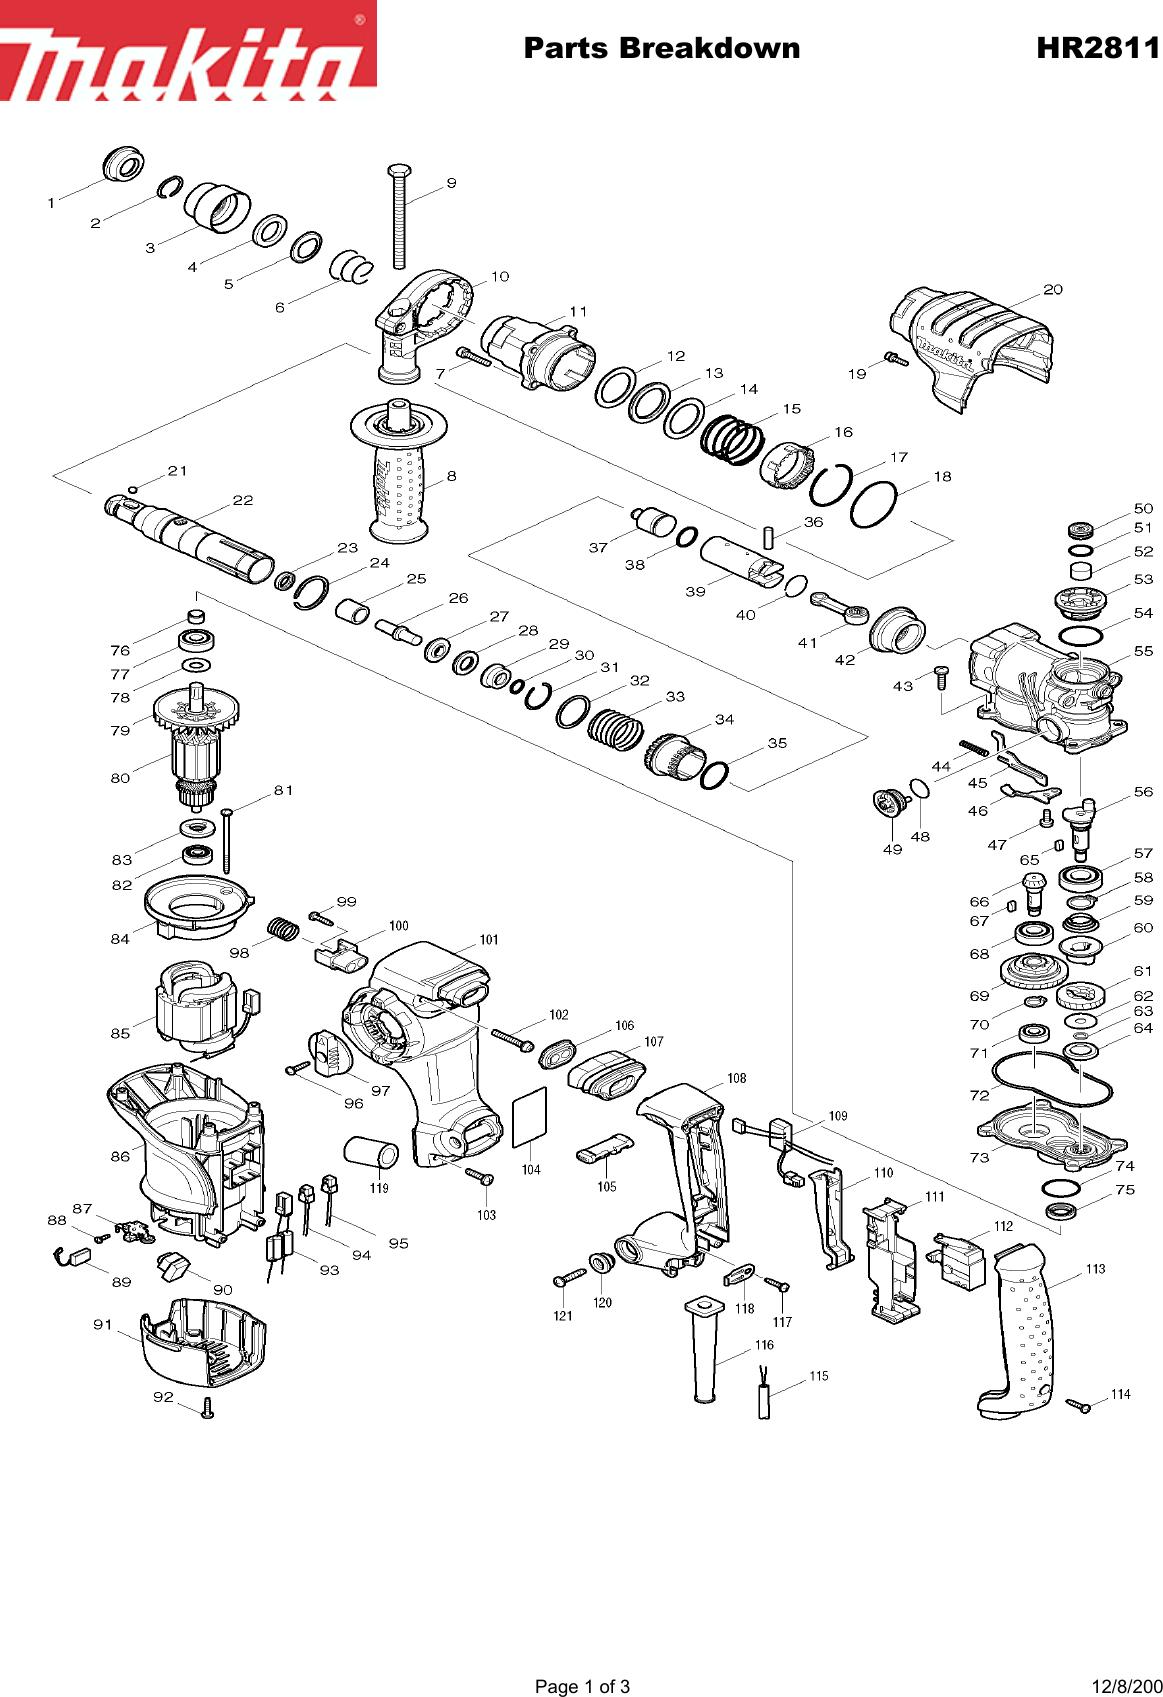 Makita Hr2811F Users Manual on